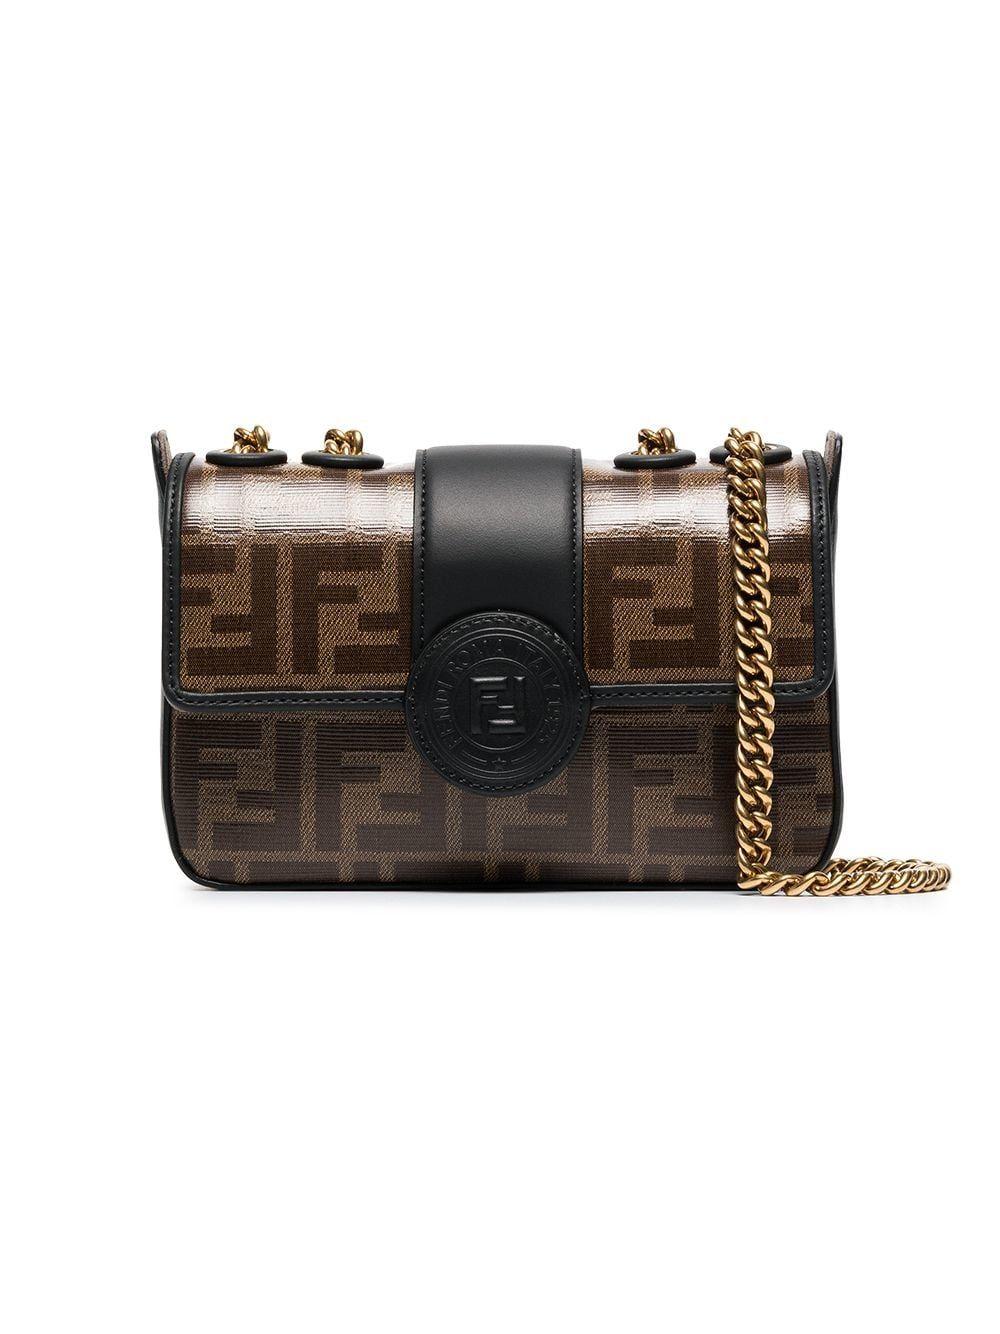 586f60d8 Fendi mini logo print double FF bag   Want   Leather crossbody bag ...